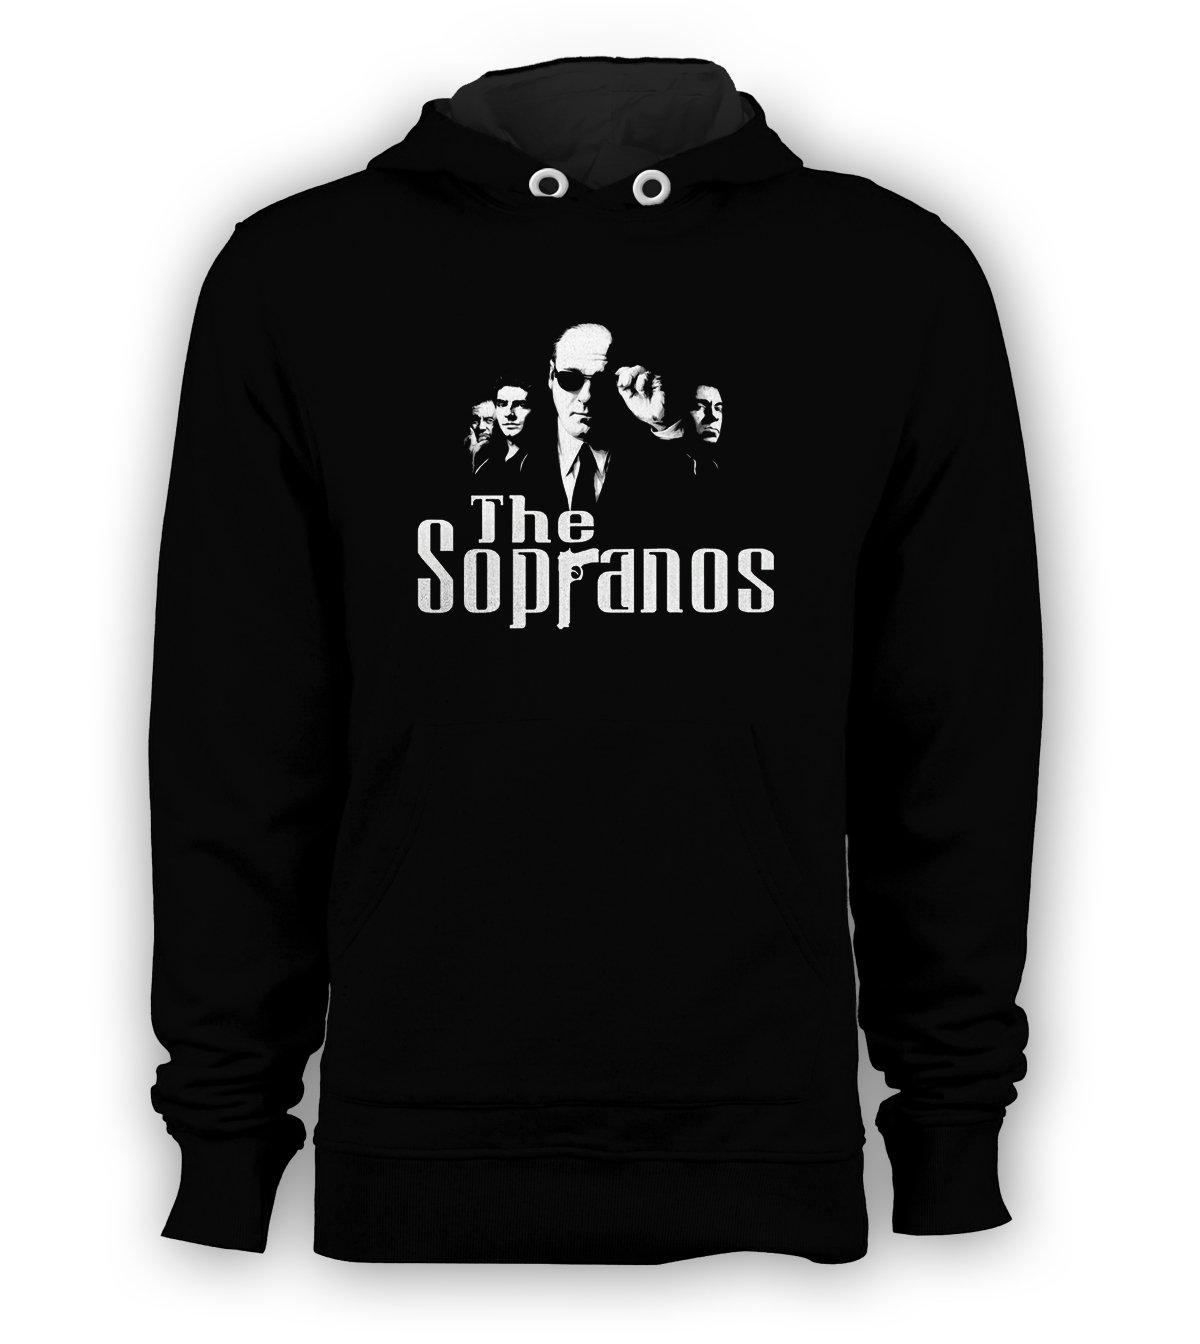 The Sopranos Movie Pullover Hoodie Men Sweatshirts Size S to 3XL New Black